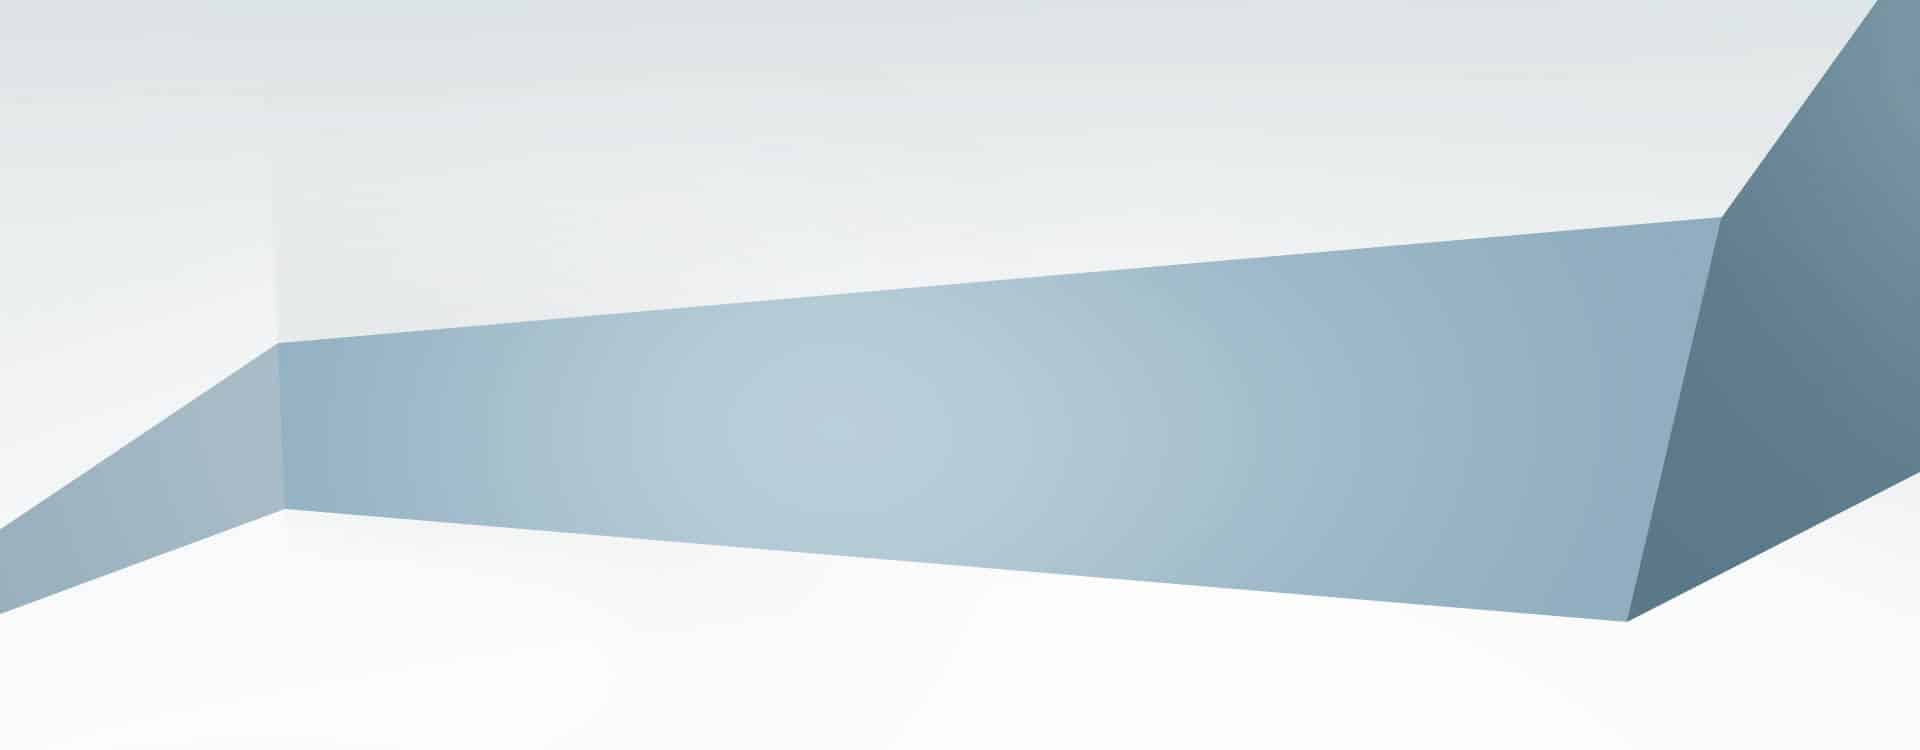 serwis opon mosina-puszczykowo